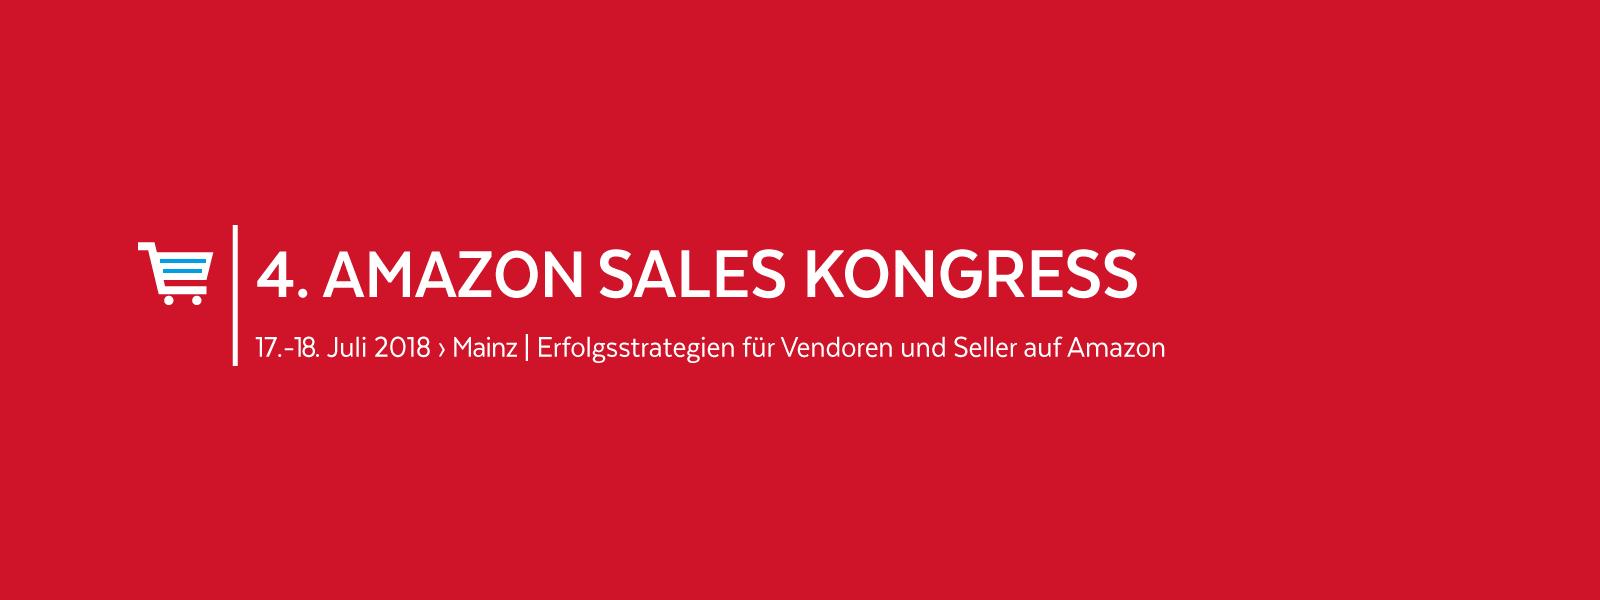 amazon-sales-kongress-2018-mainz